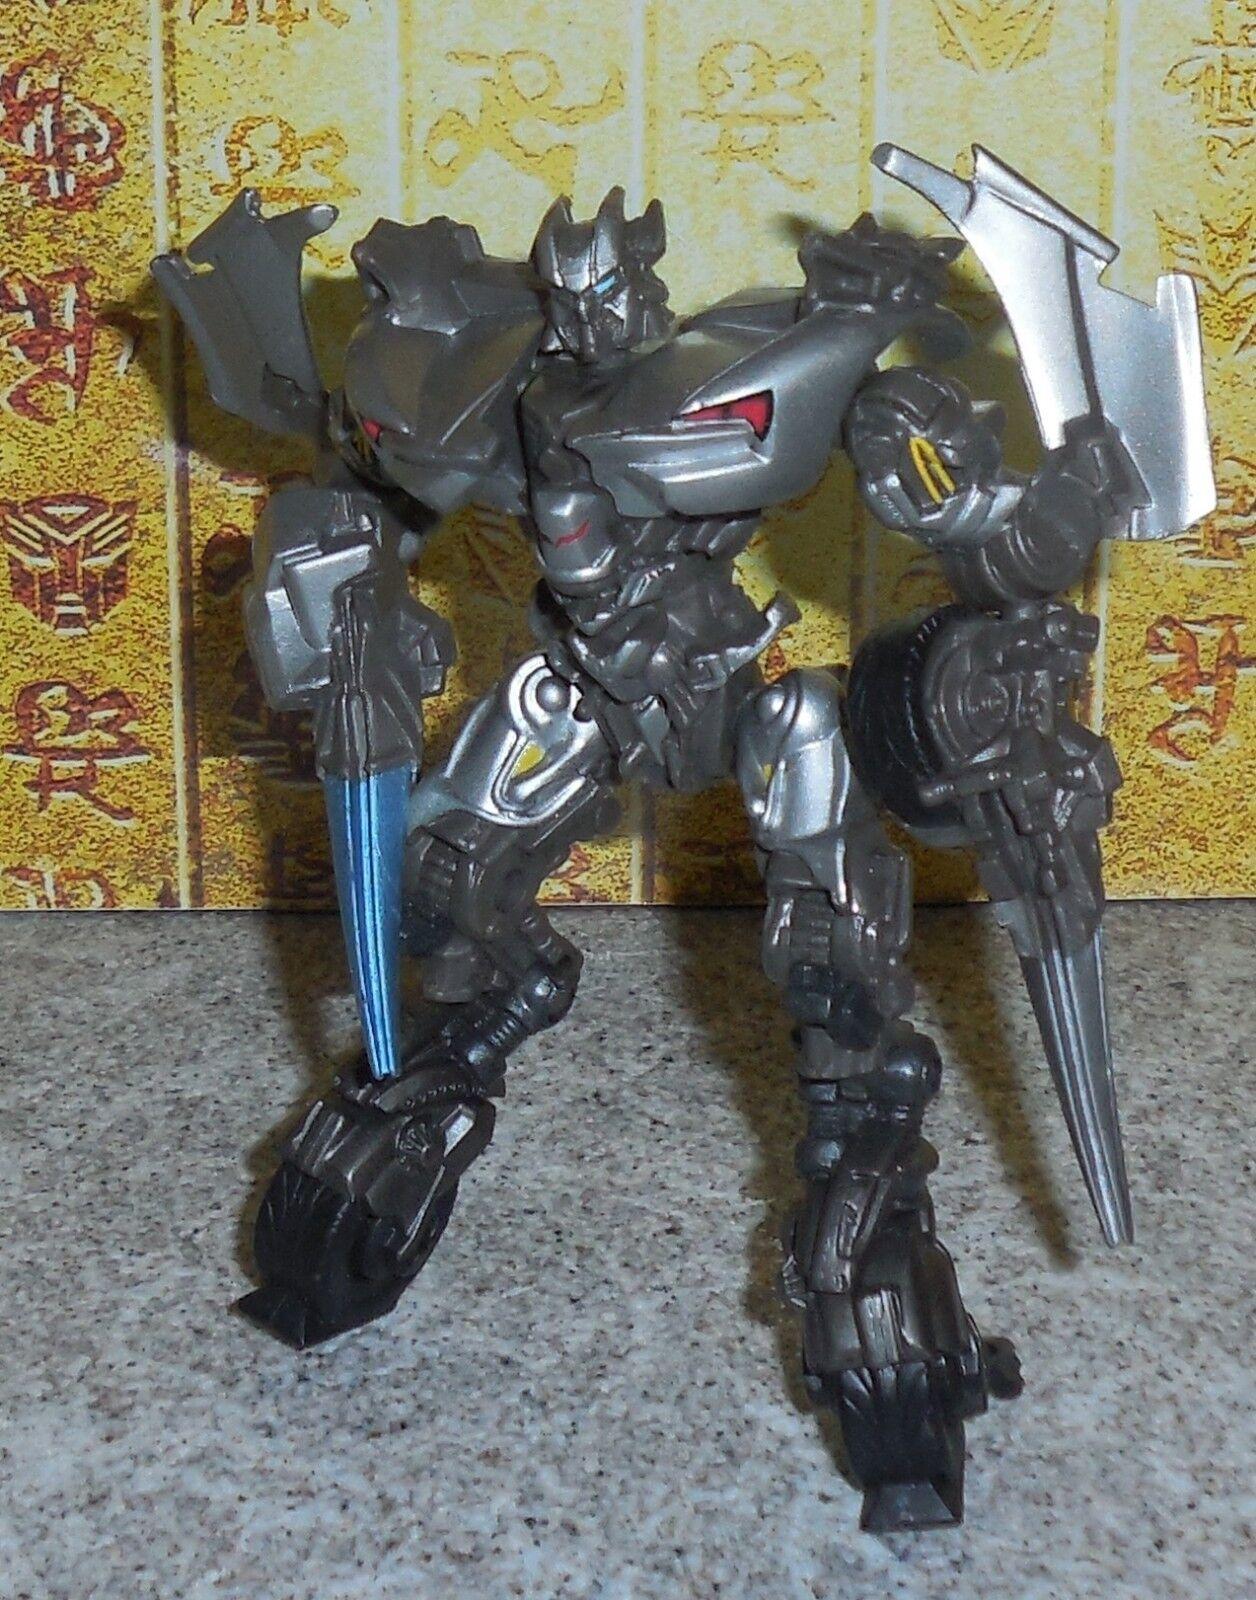 Transformers redf Robot Replicas SIDESWIPE Revenge Of The Fallen Figurine